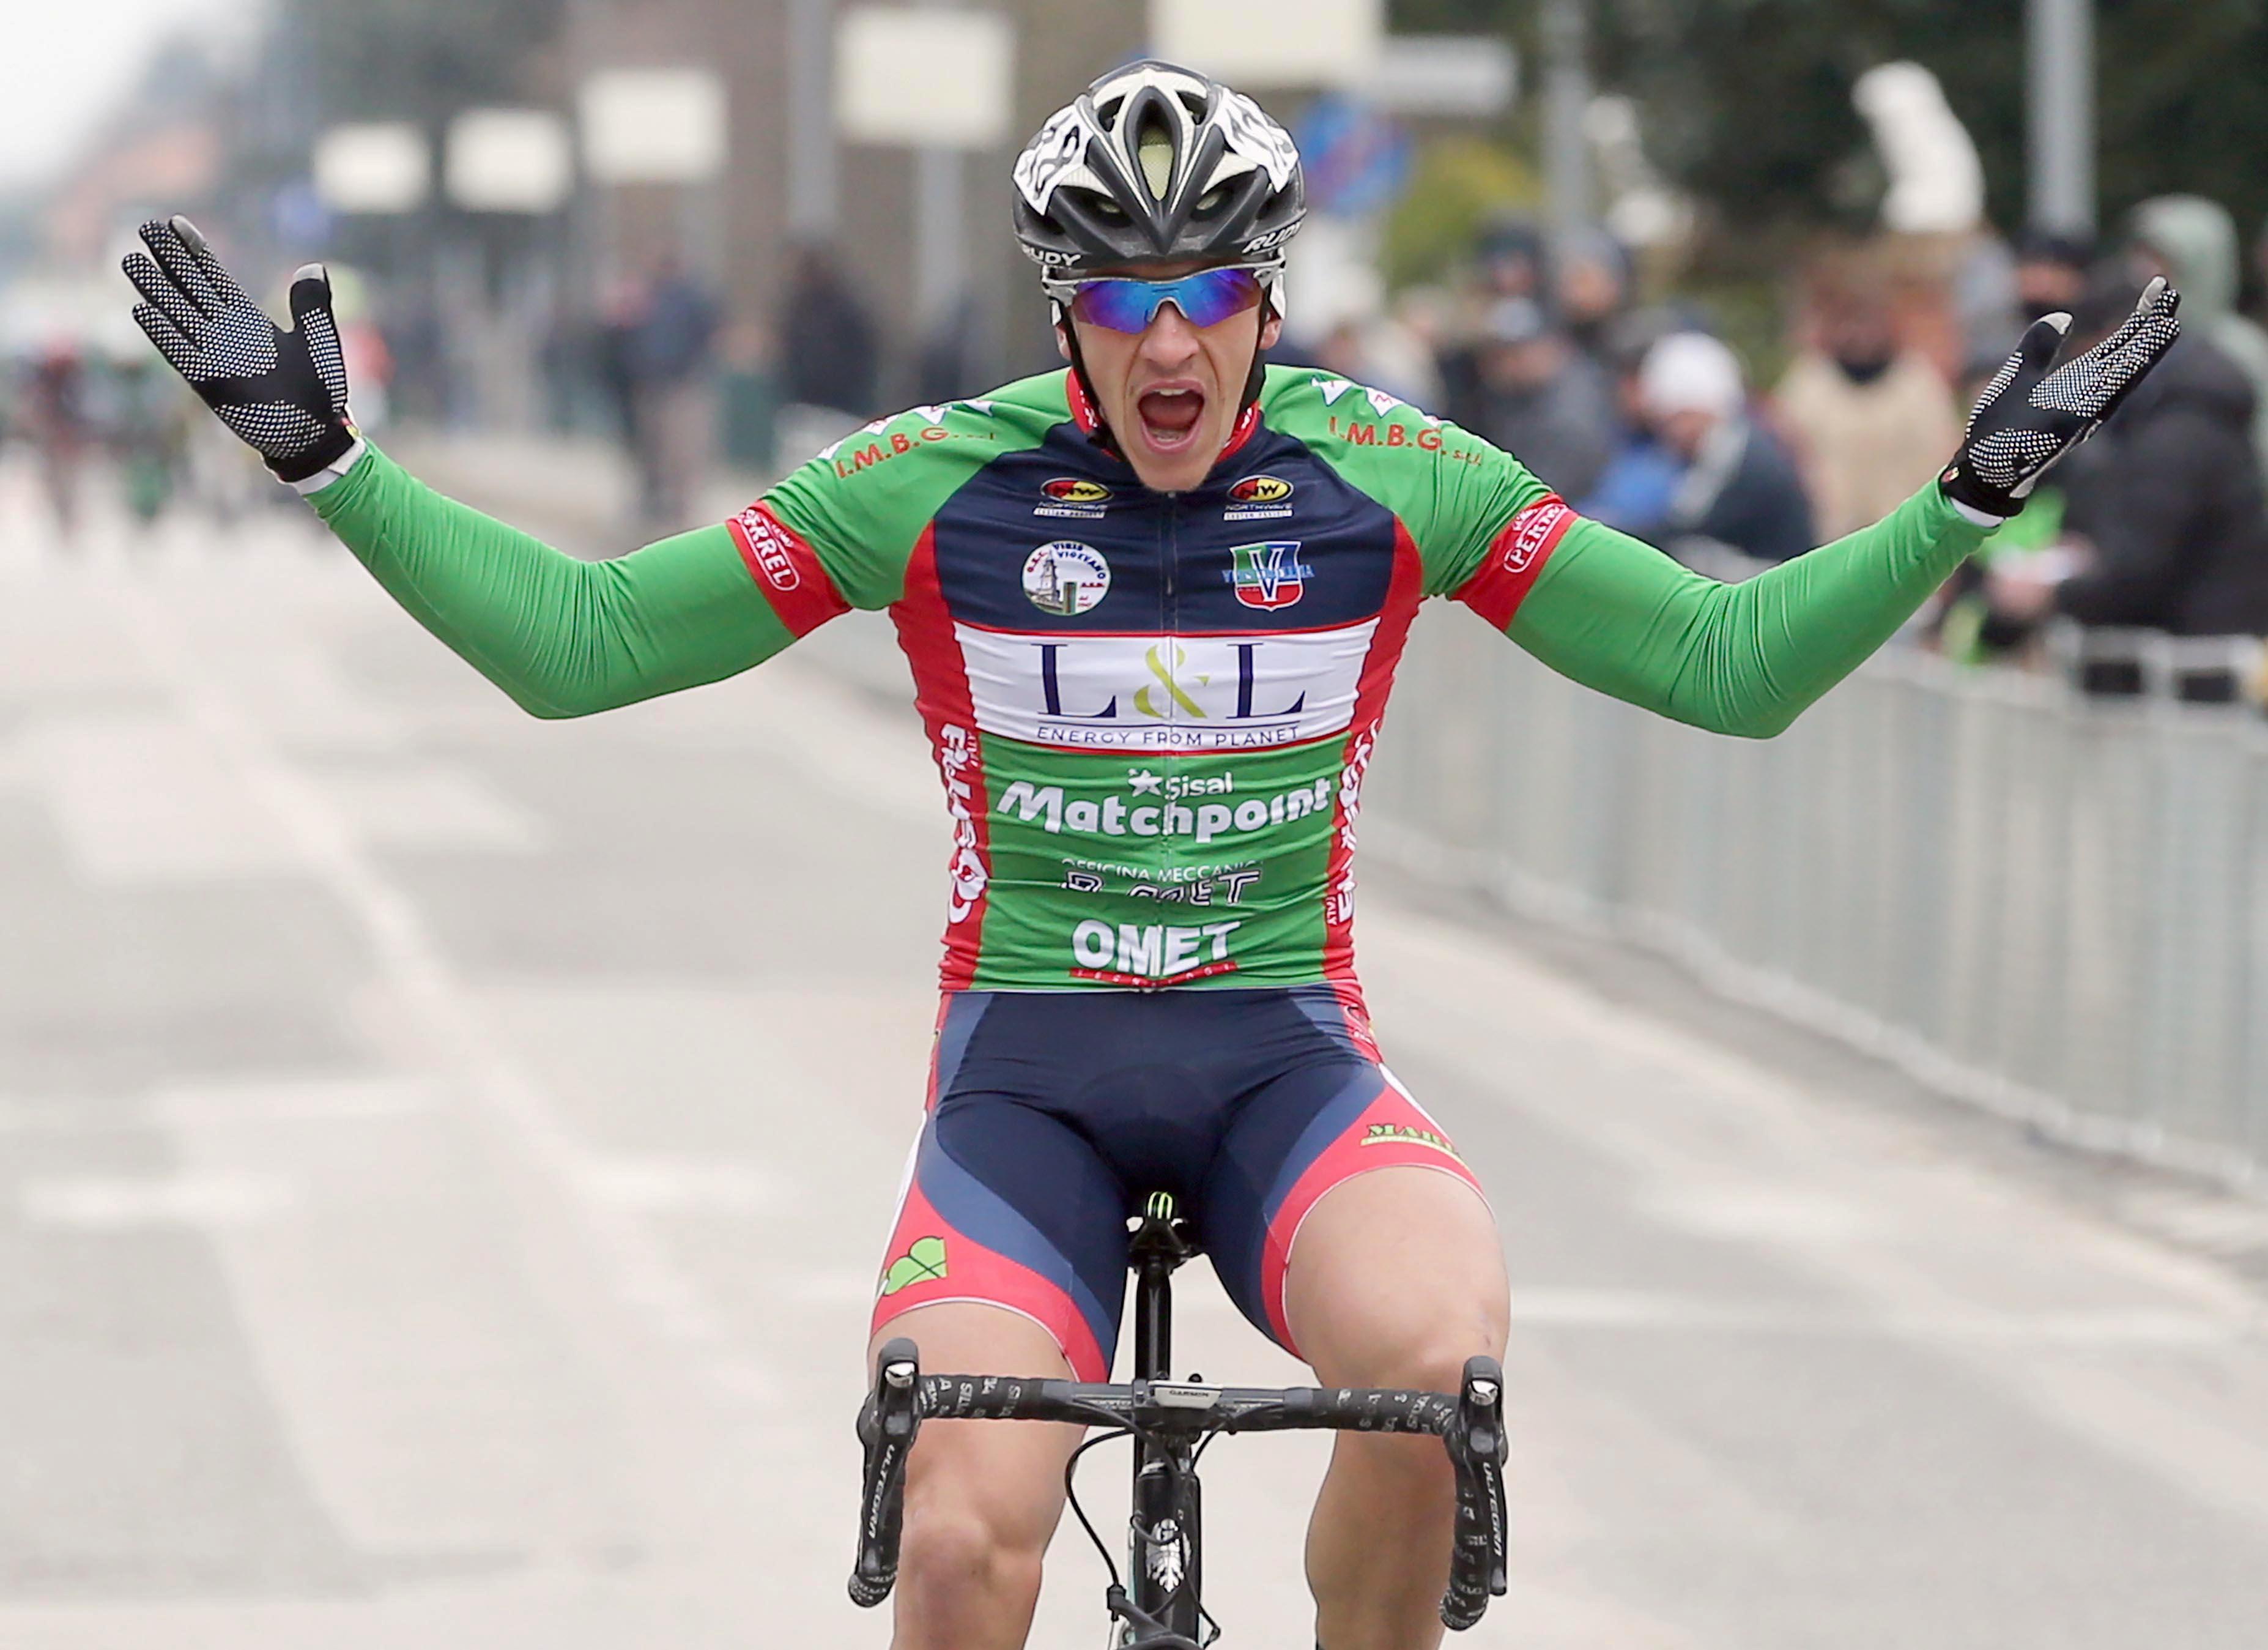 Davide Donesana vince la 59/a Coppa San Bernardino